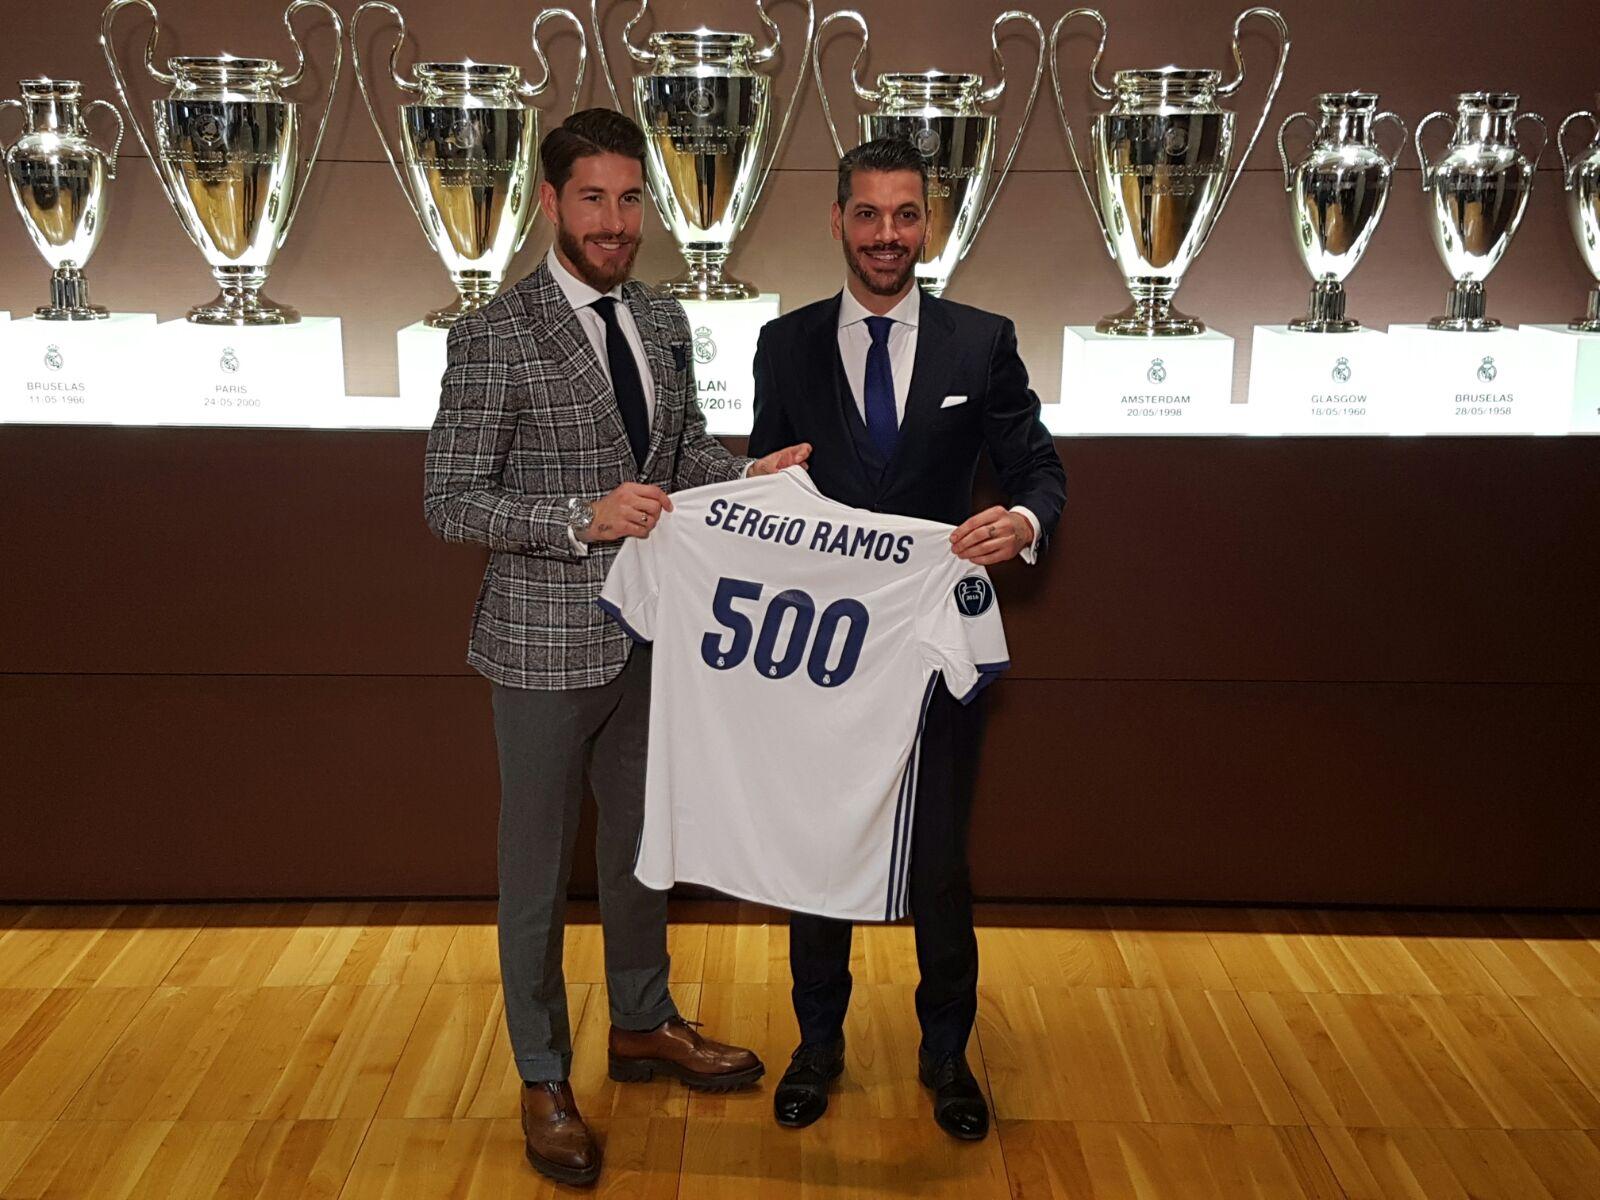 sergio 500 matches